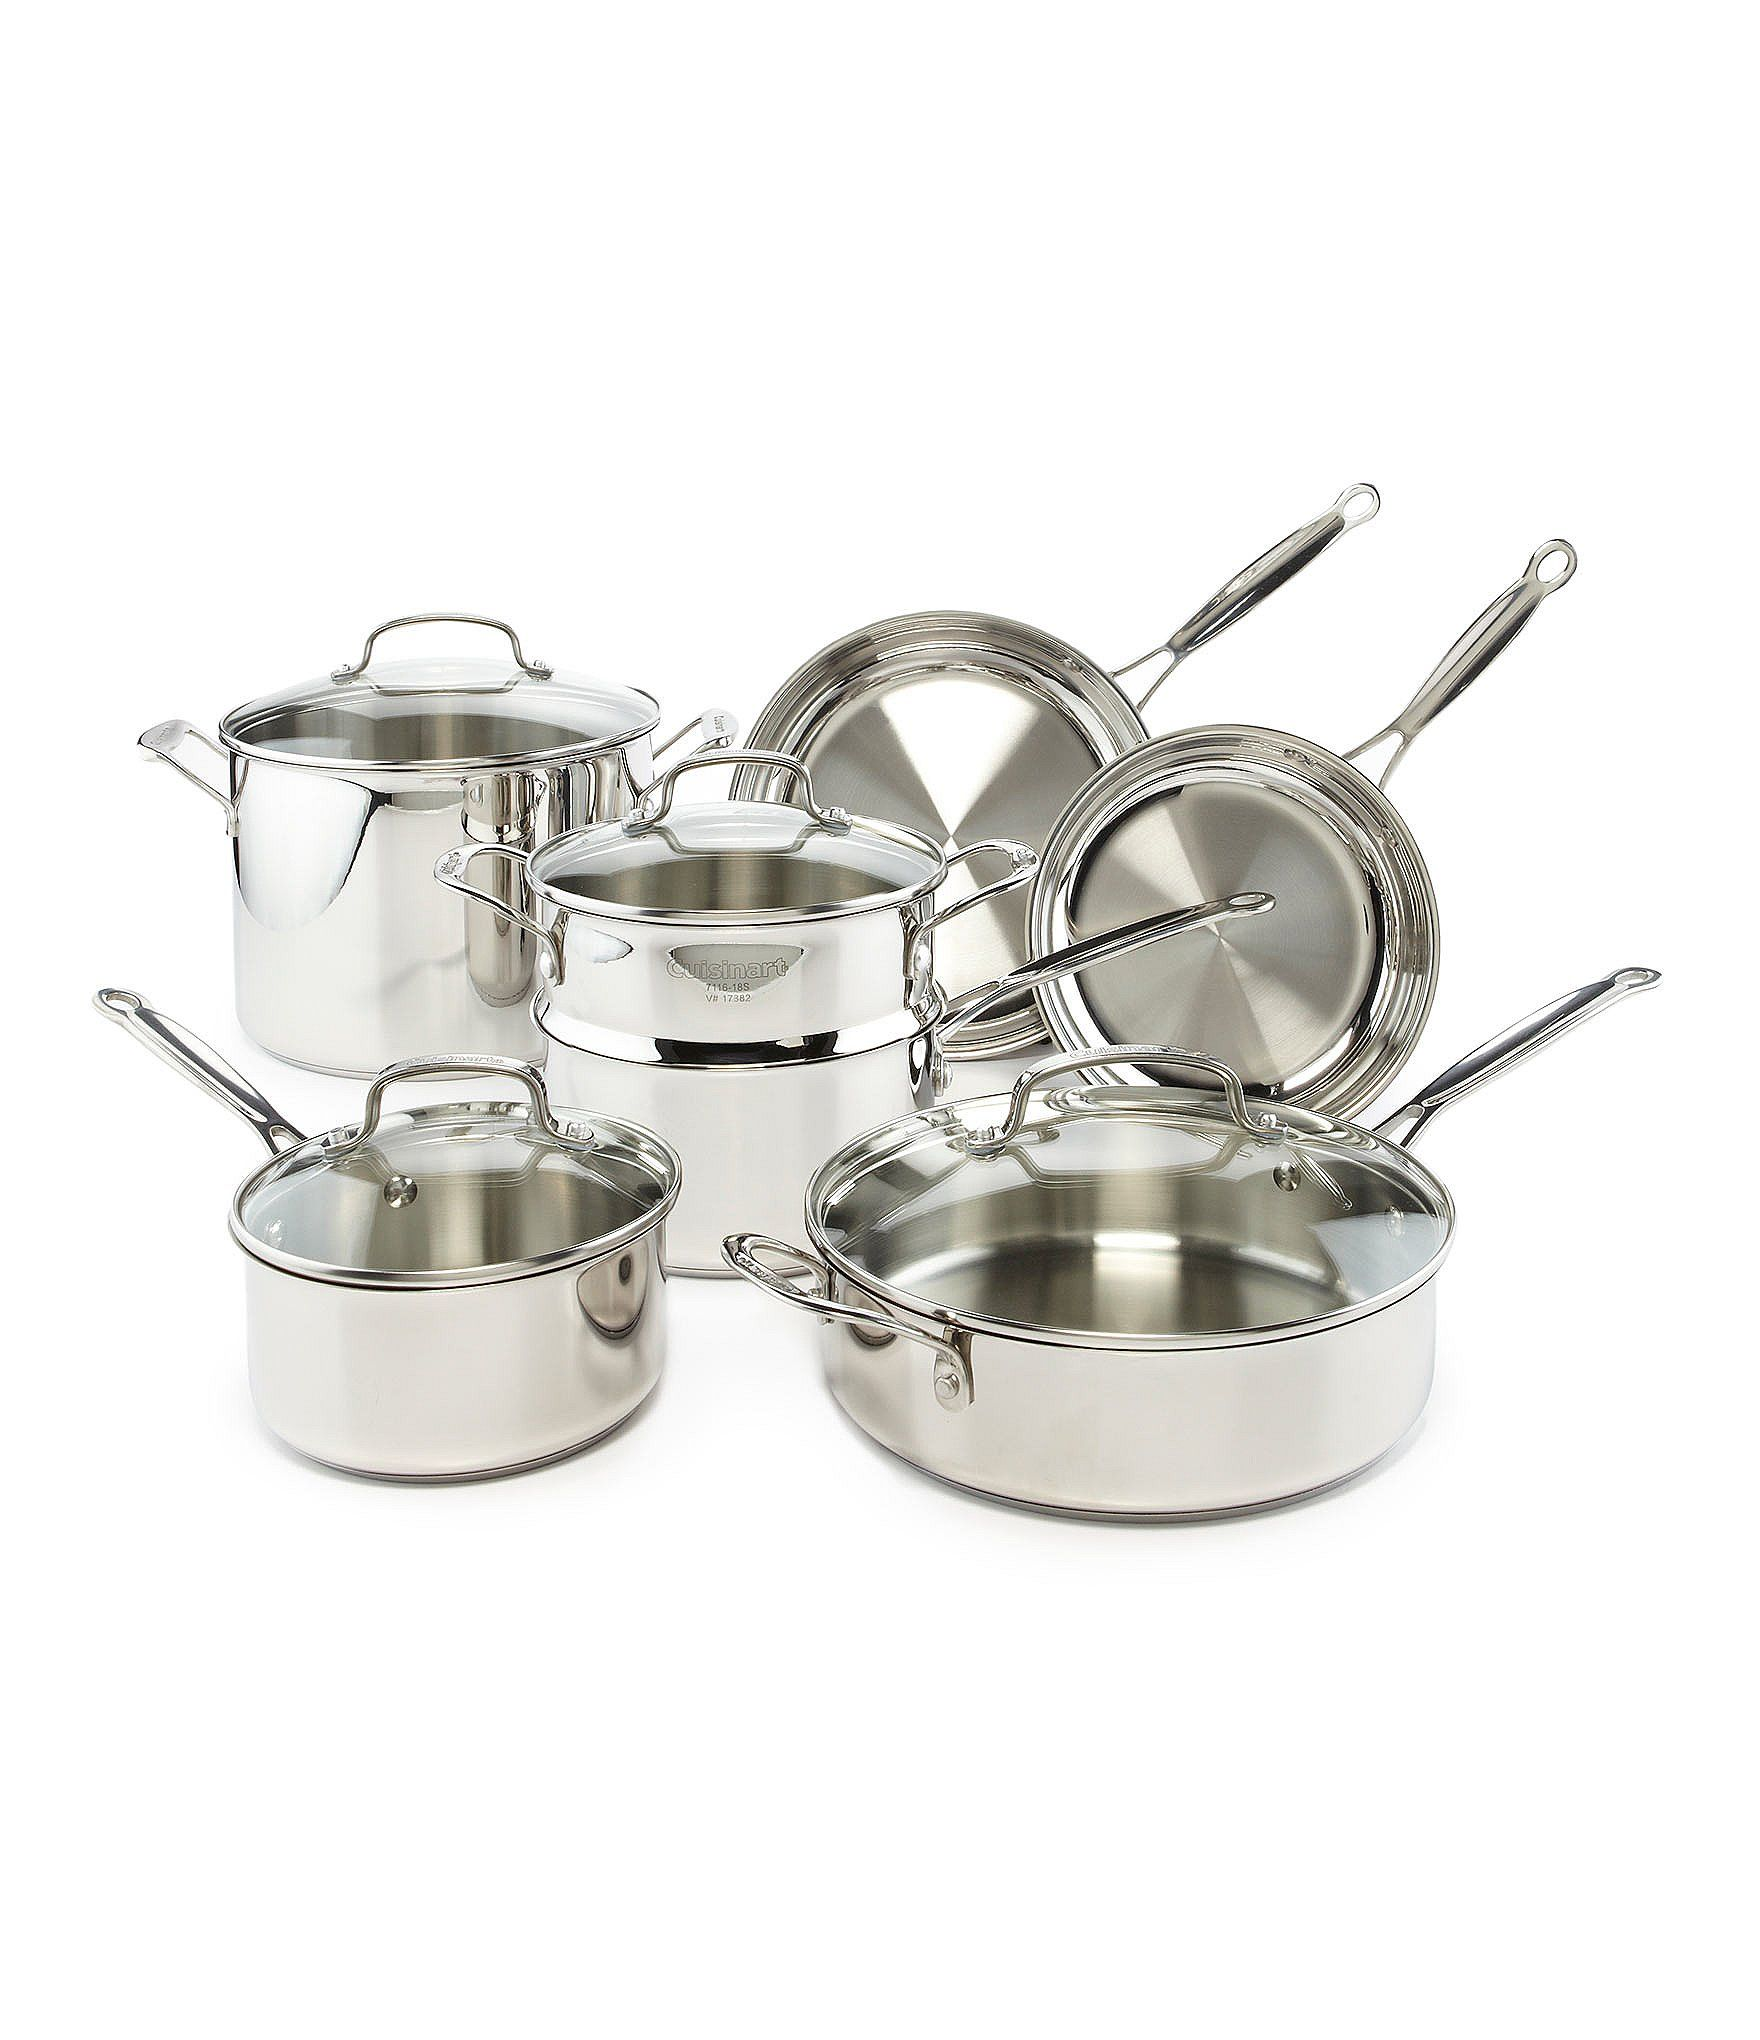 Cuisinart Chef S Classic Stainless Steel 11 Piece Cookware Set Dillard S In 2021 Cookware Set Cuisinart Piecings Cuisinart 11 piece cookware set